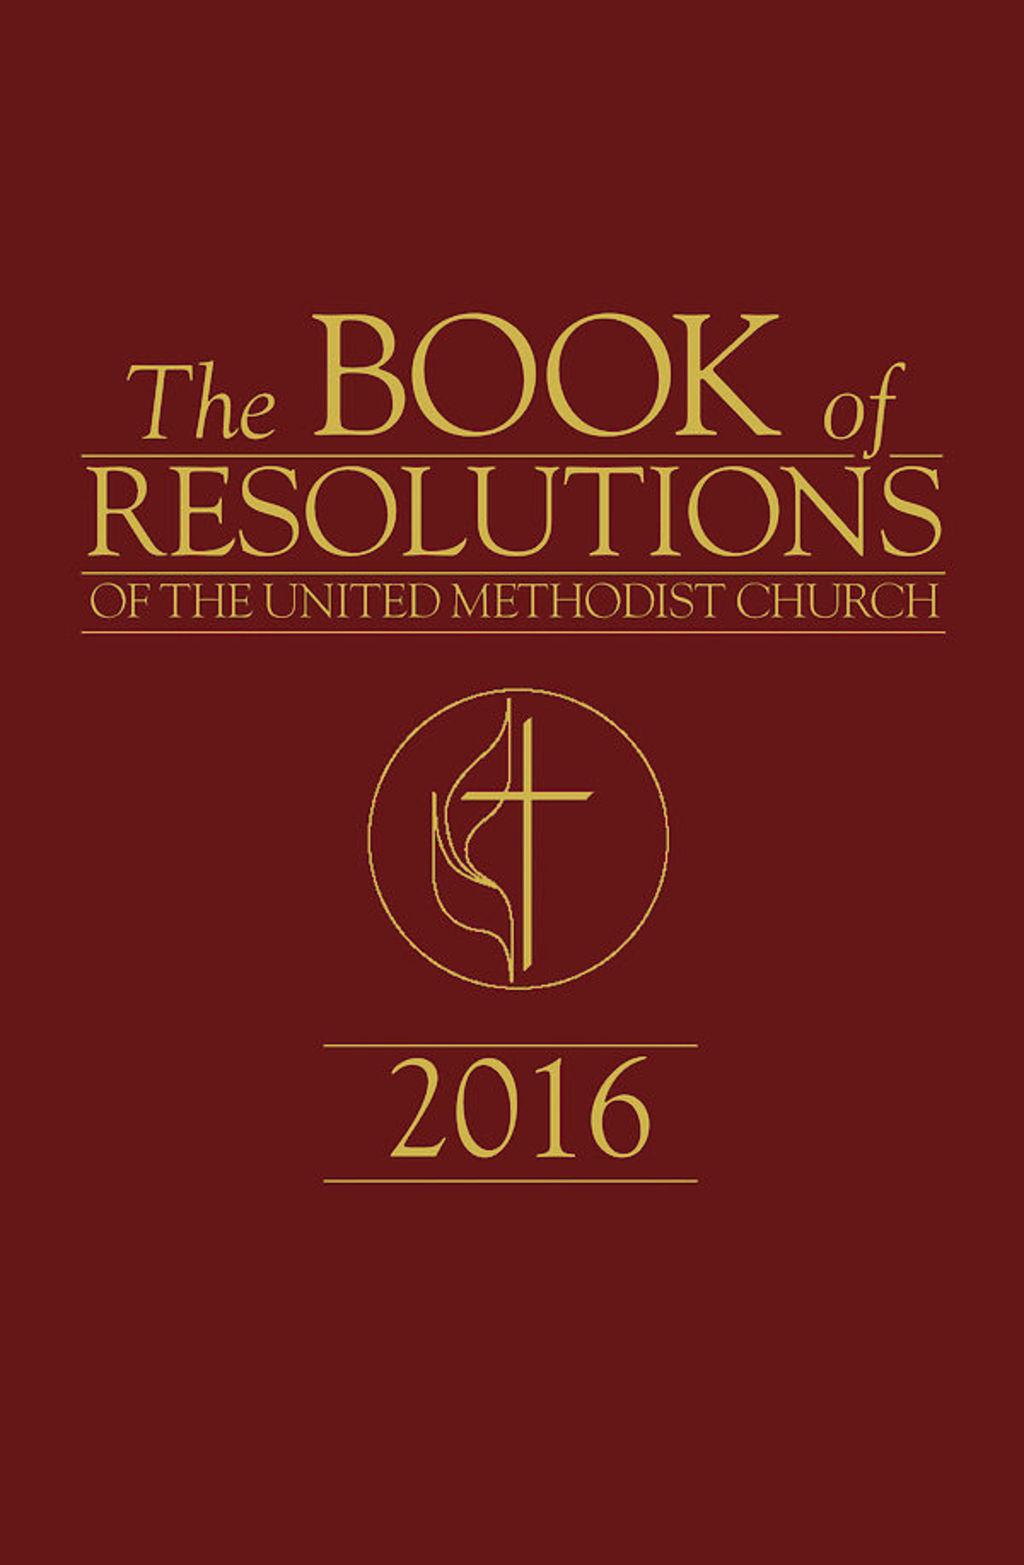 By United Methodist Church PRINTISBN: 9781501833250 E-TEXT ISBN: 9781501833250 Edition: 0